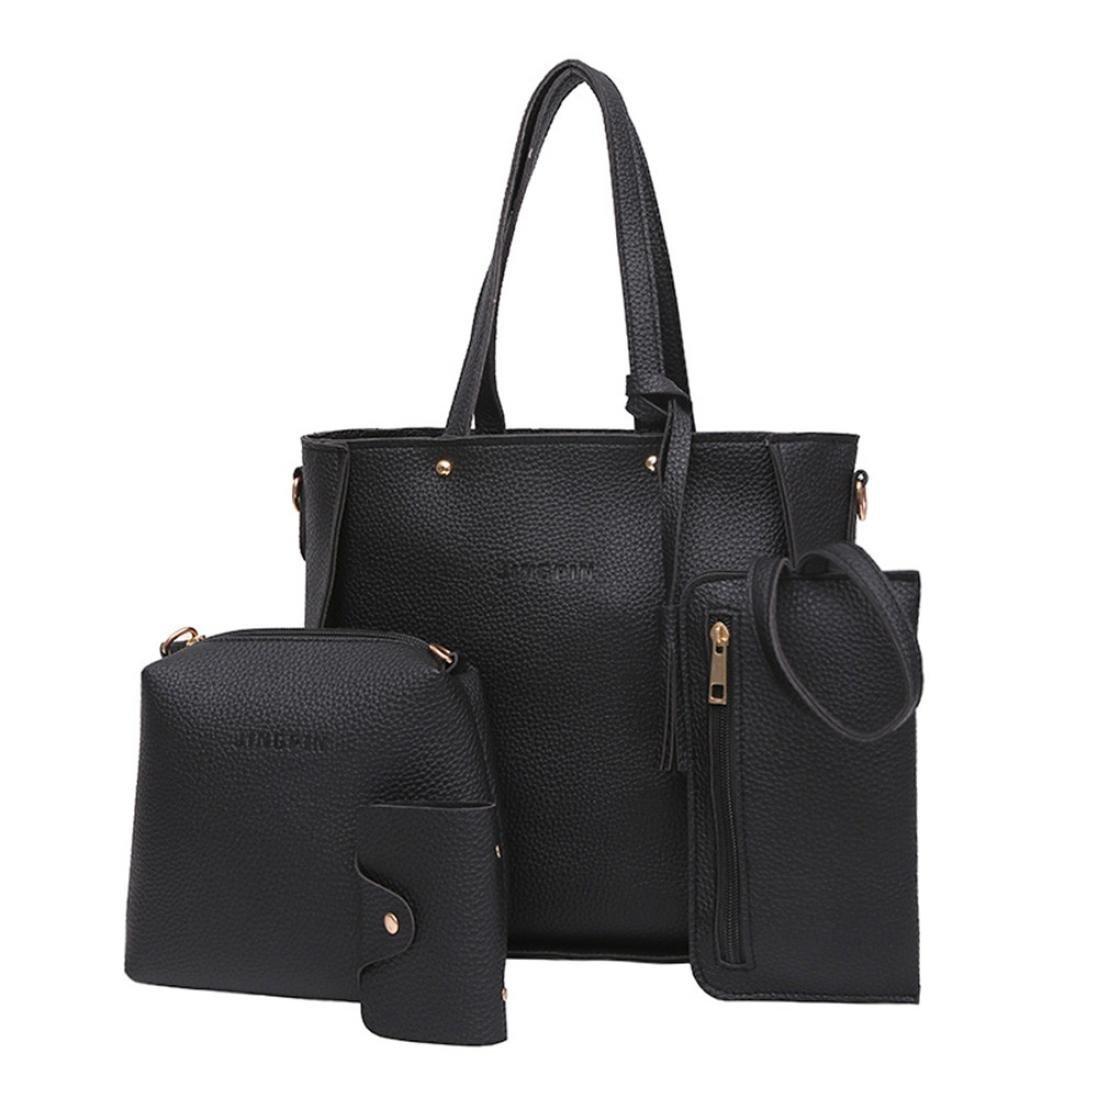 Pocciol Women Love Bags, Women Super Fashion Versatile 4 Pcs Handbag Tote Bag Crossbody Wallet Shoulder Bags (Black)